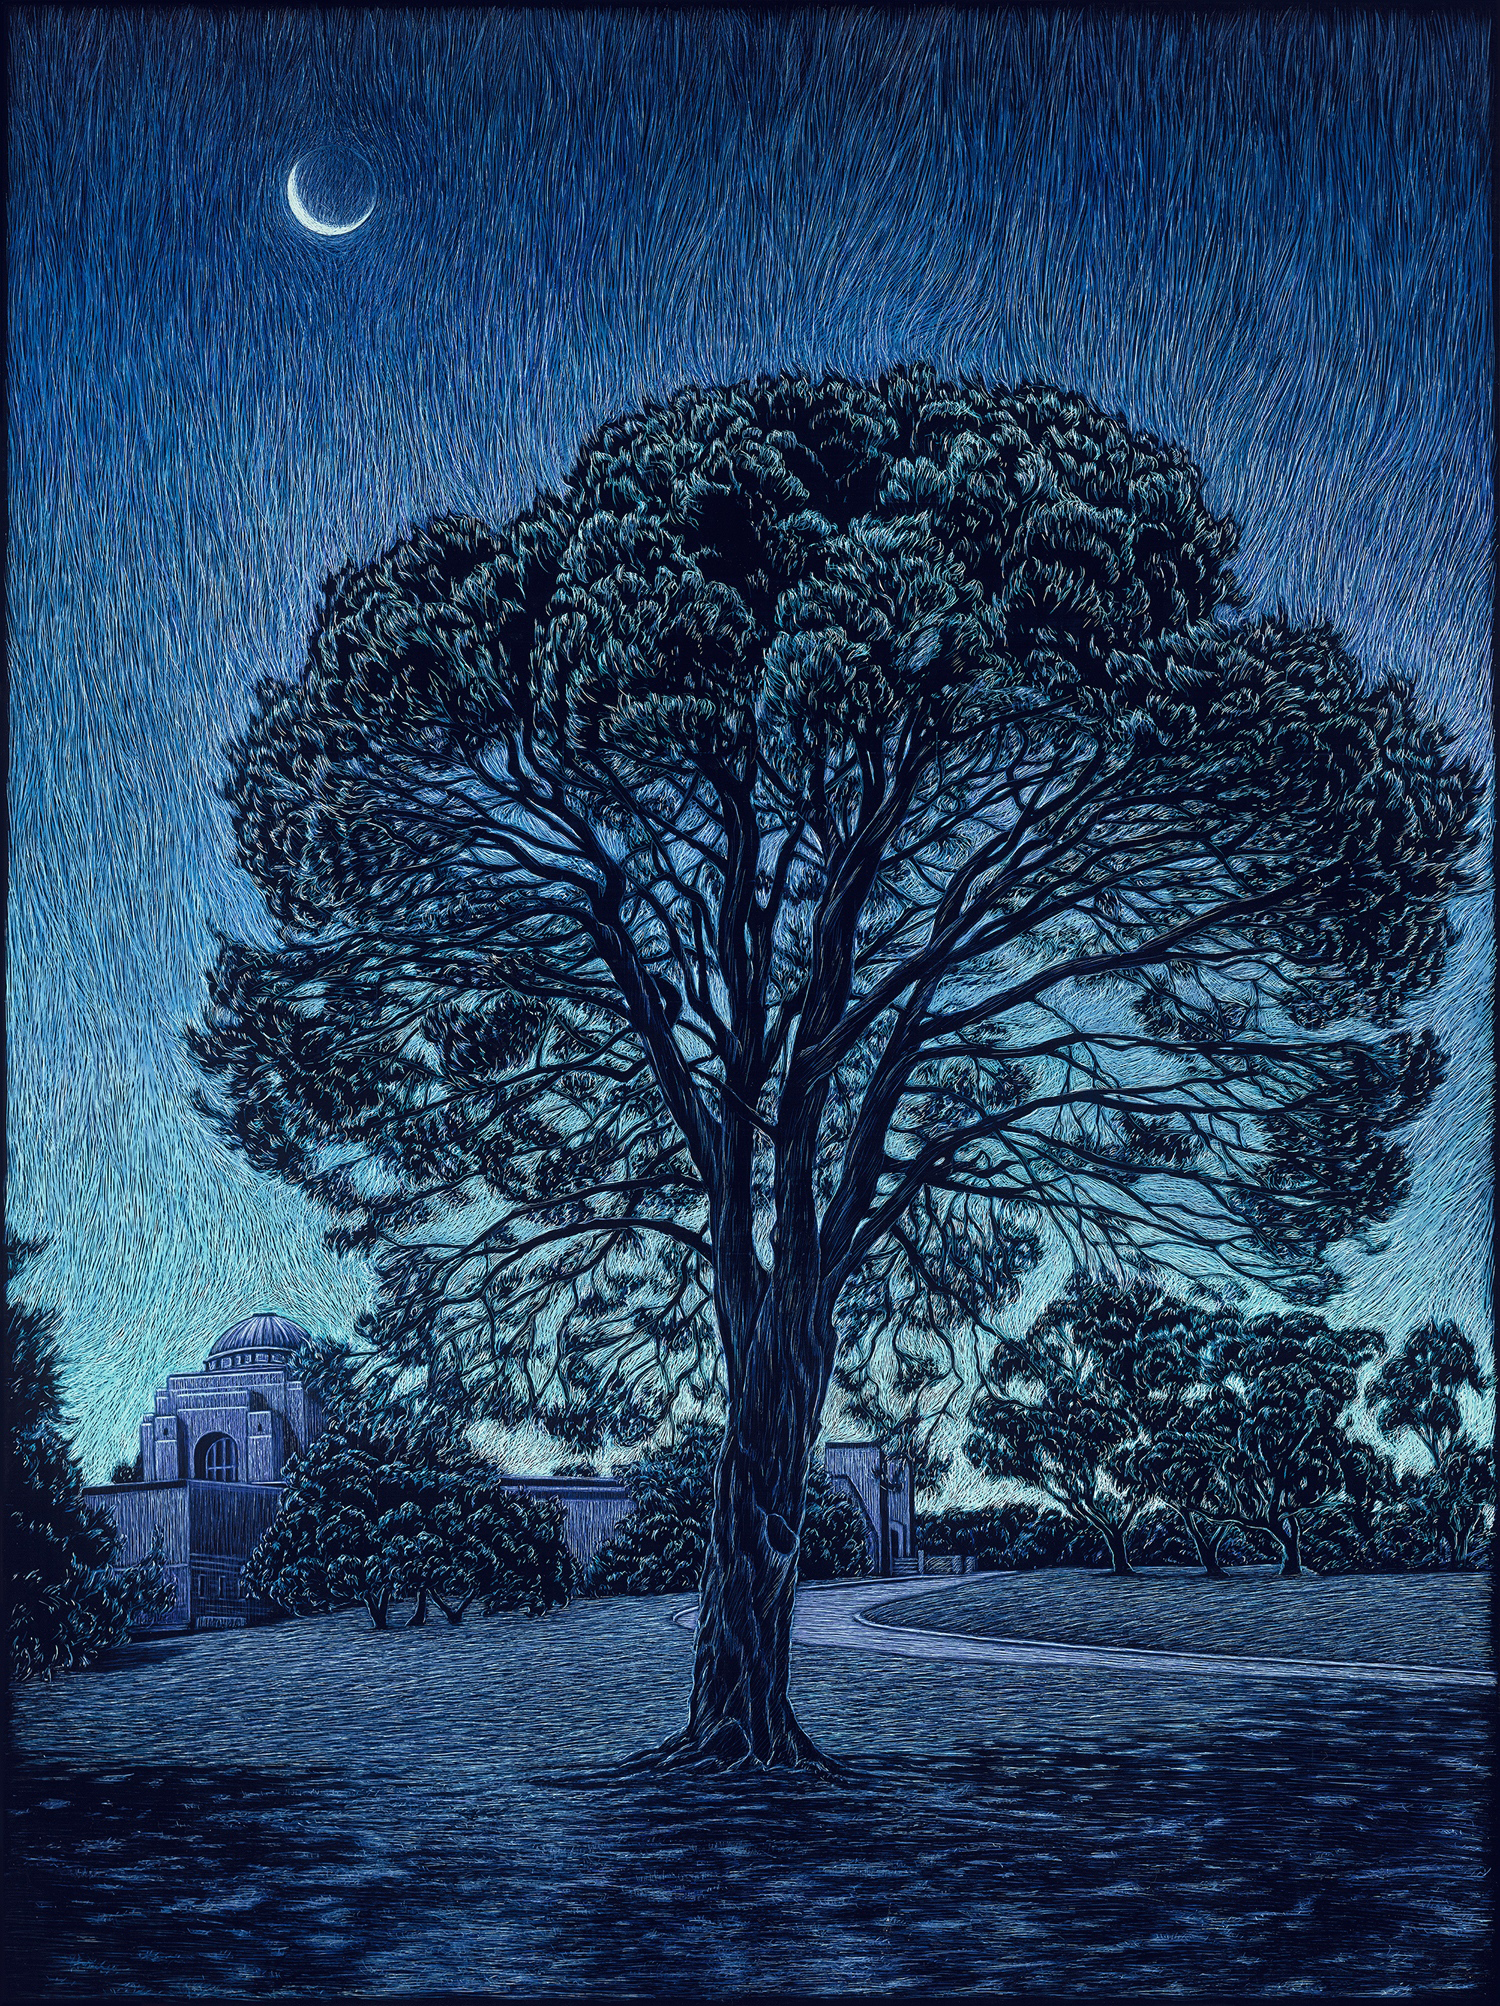 lone-pine-australian-war-memorial-engraving-rachel-newling.jpg